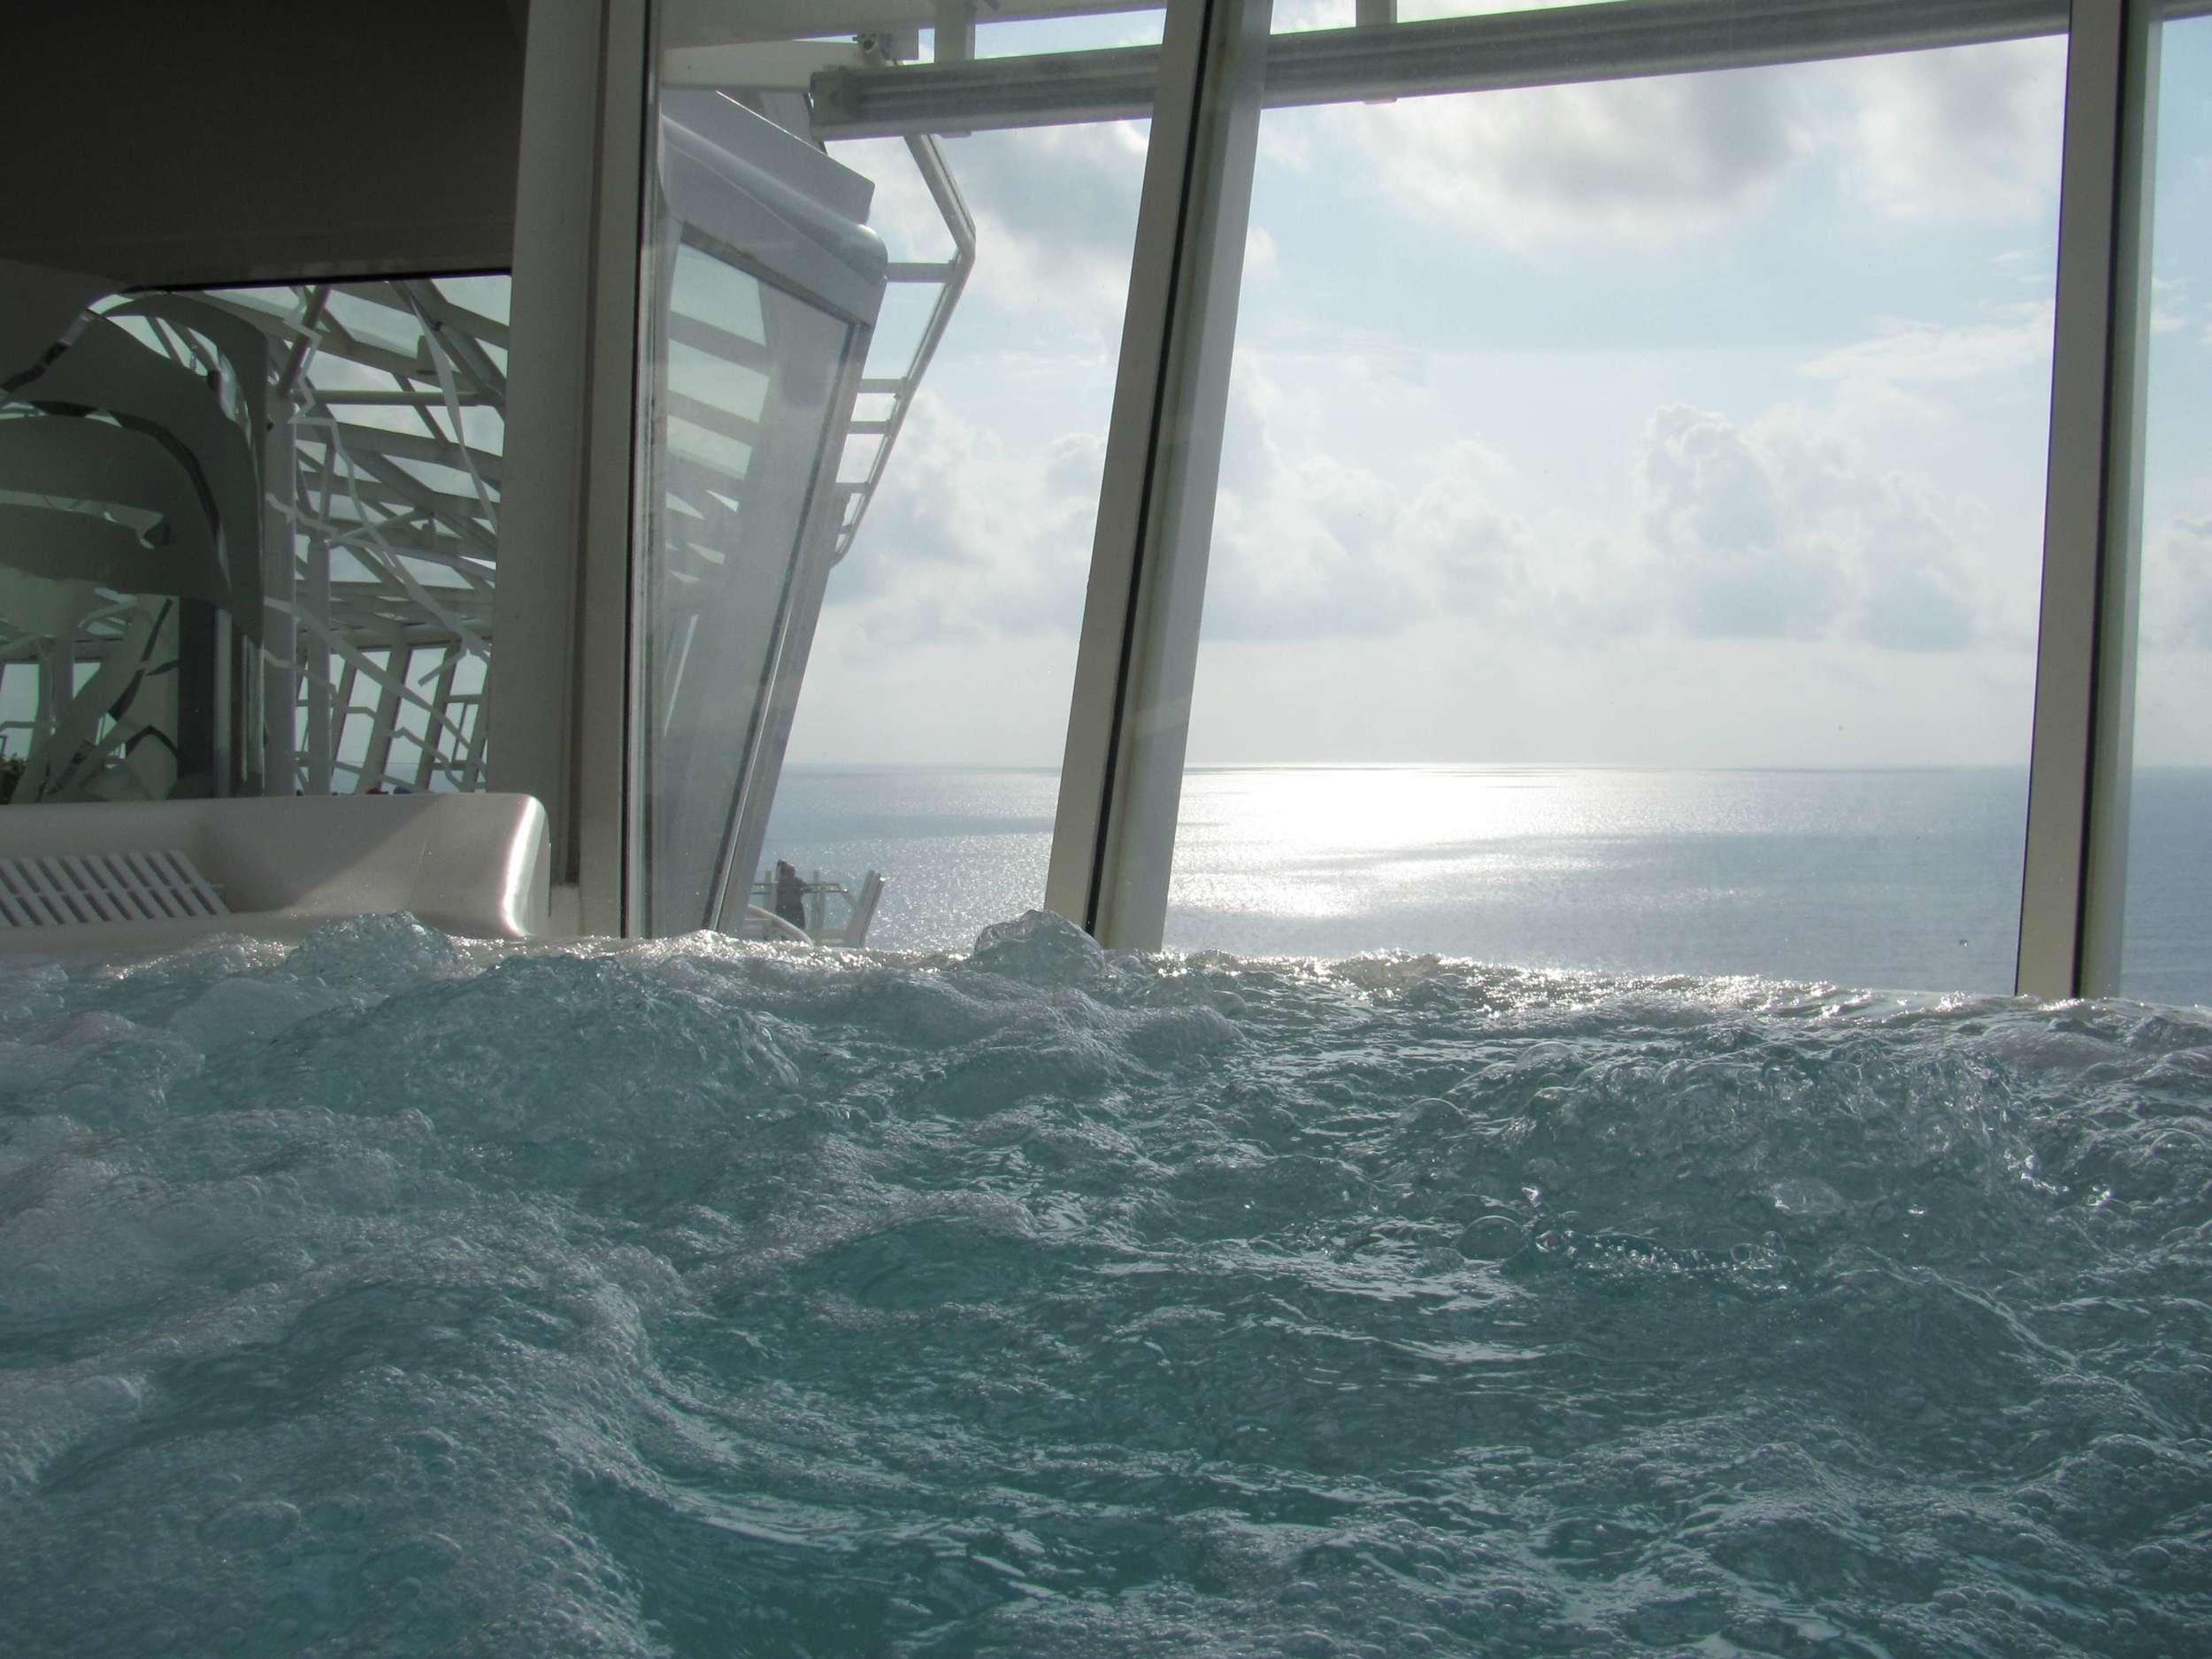 2012-04-20 Oasis of the Seas (5)-4000